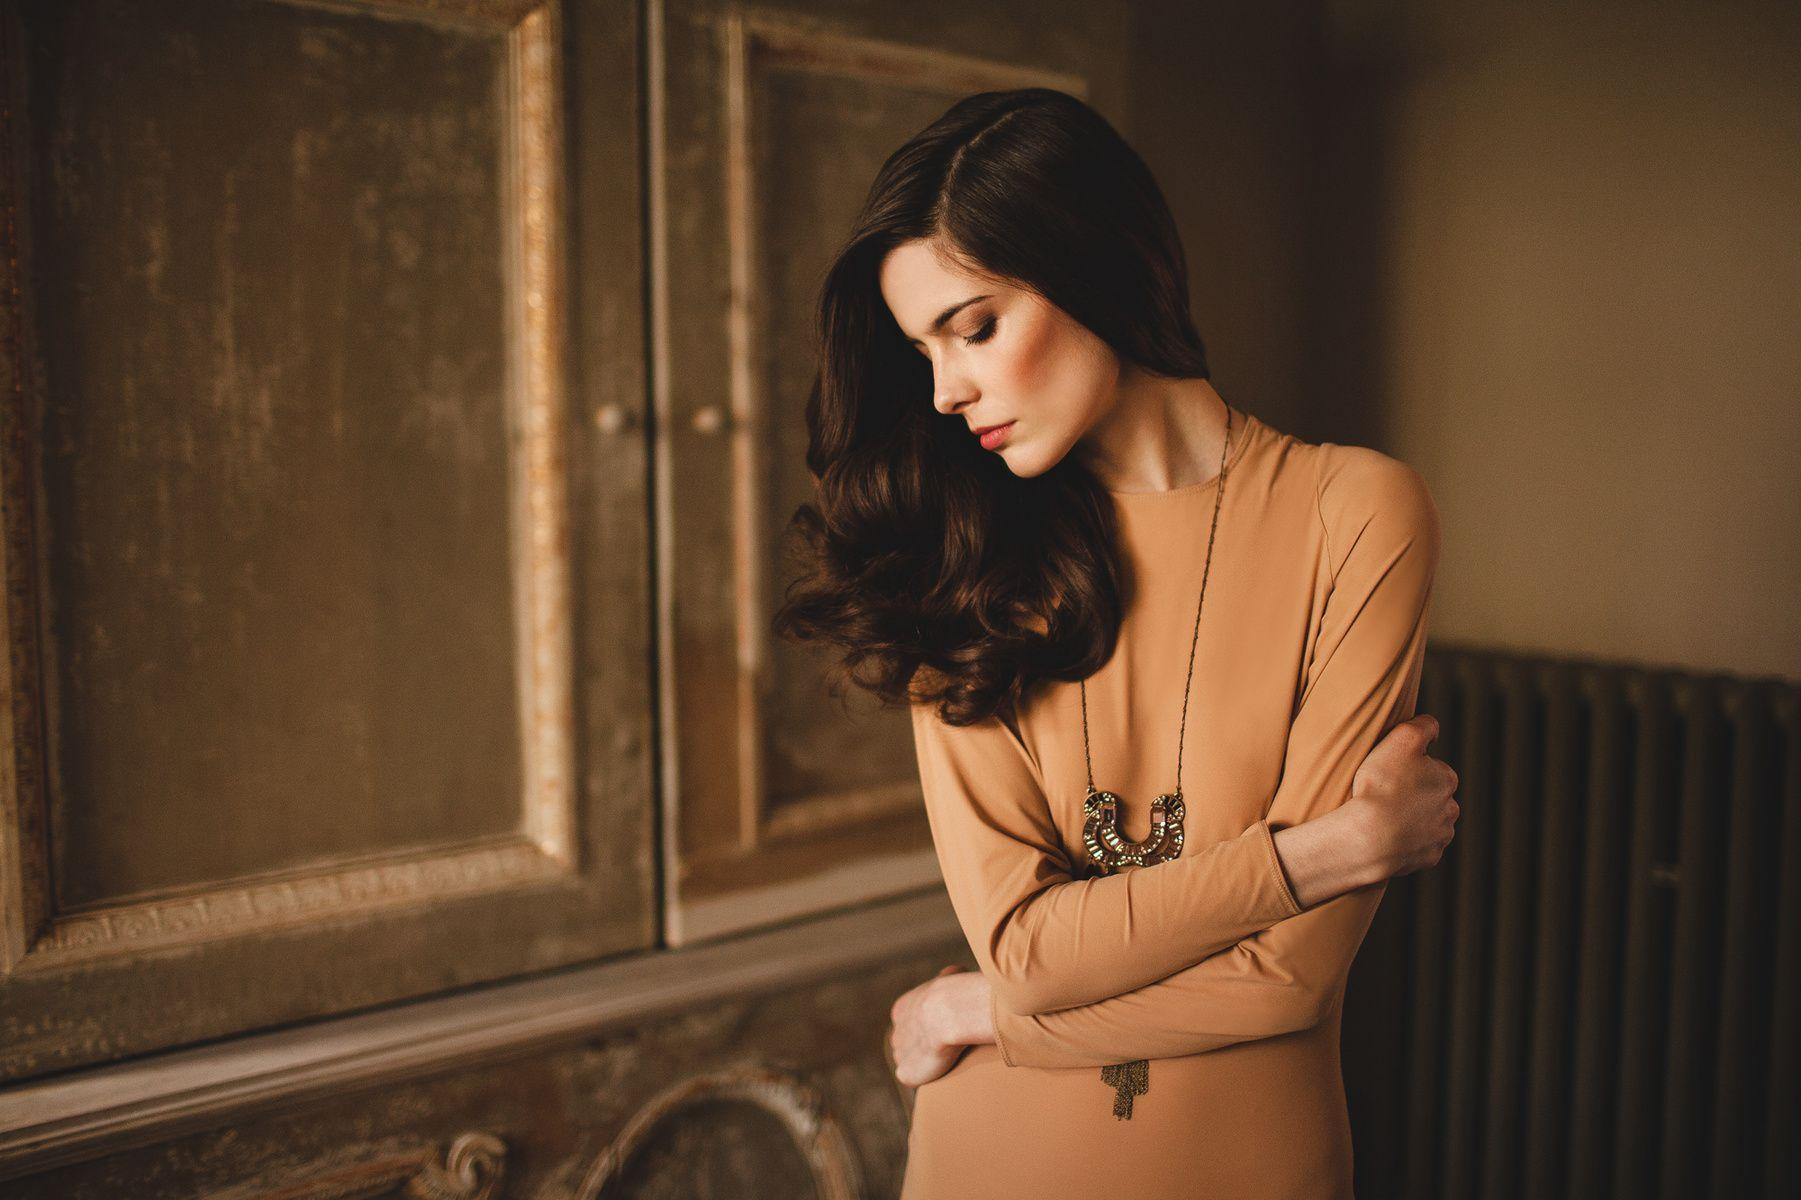 Julia Trotti Photography - paul edmonds 2013, london